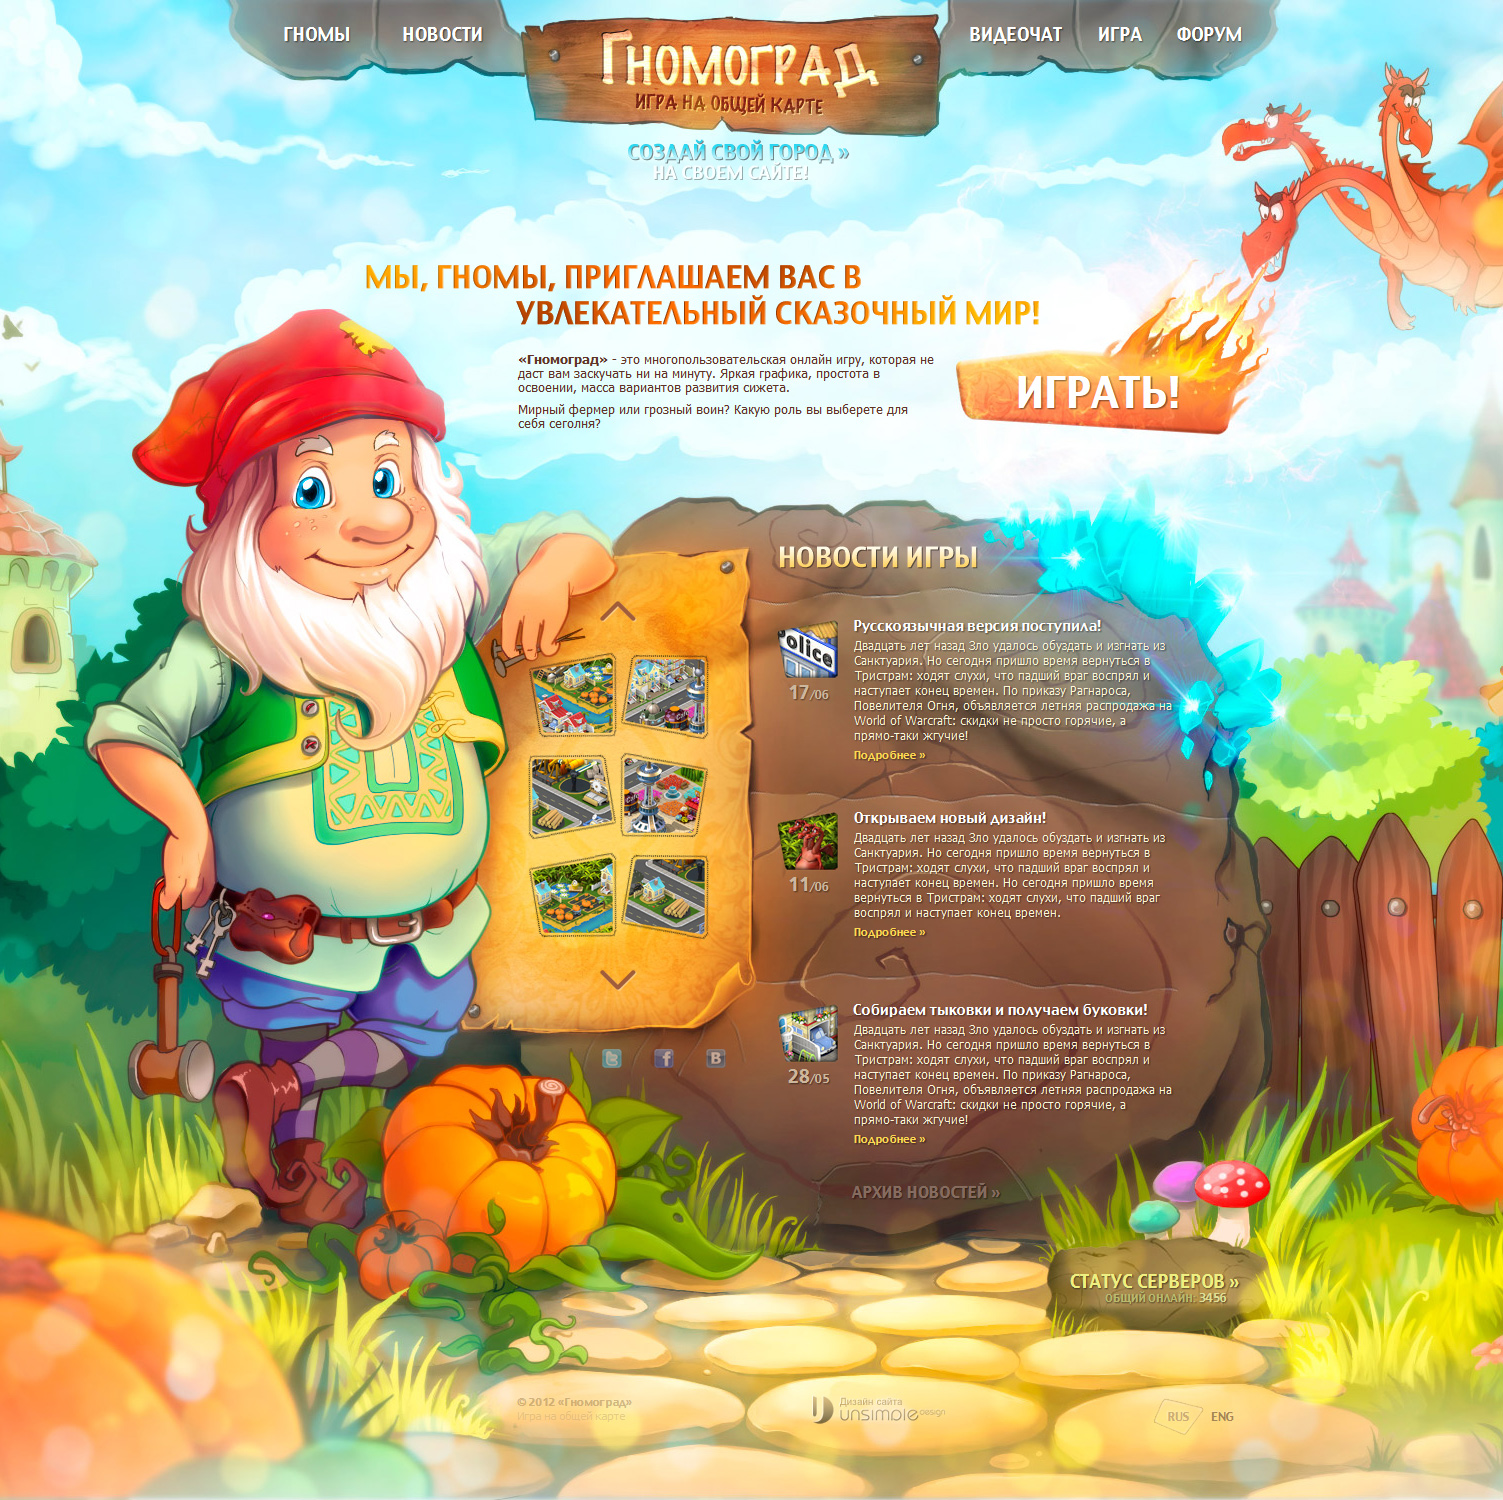 Гномоград - игра на общей карте